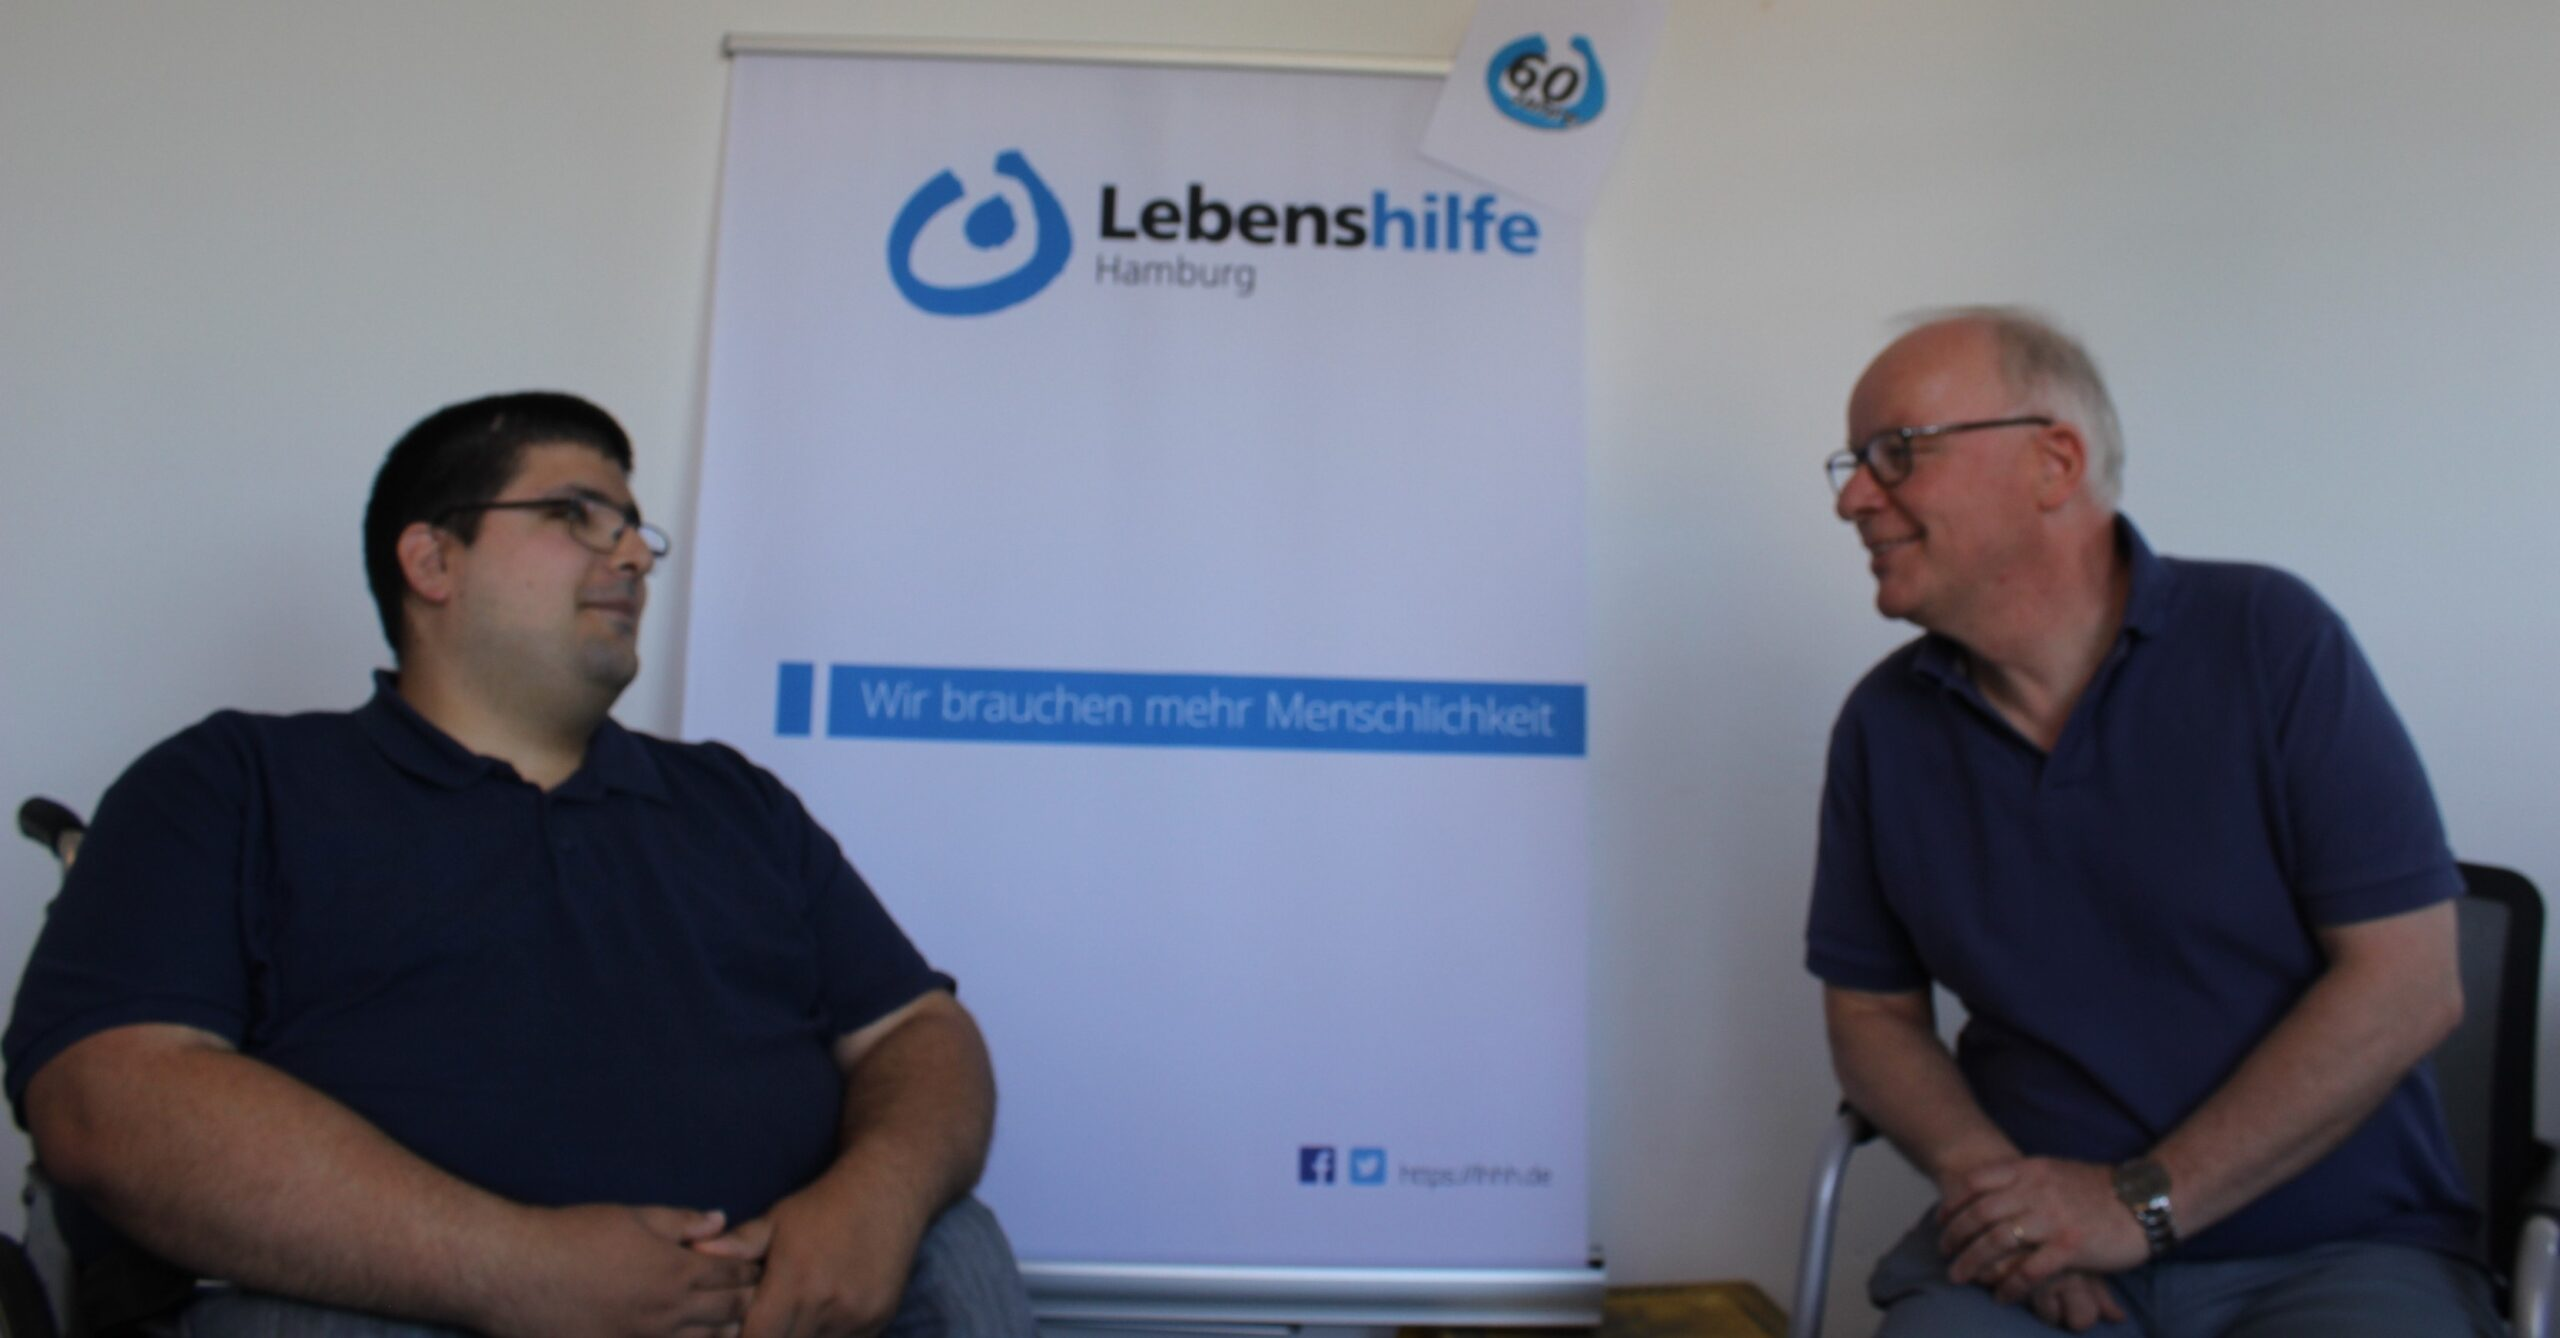 Matthiasa Bartke und Sadeg Borati sitzen nebeneinander